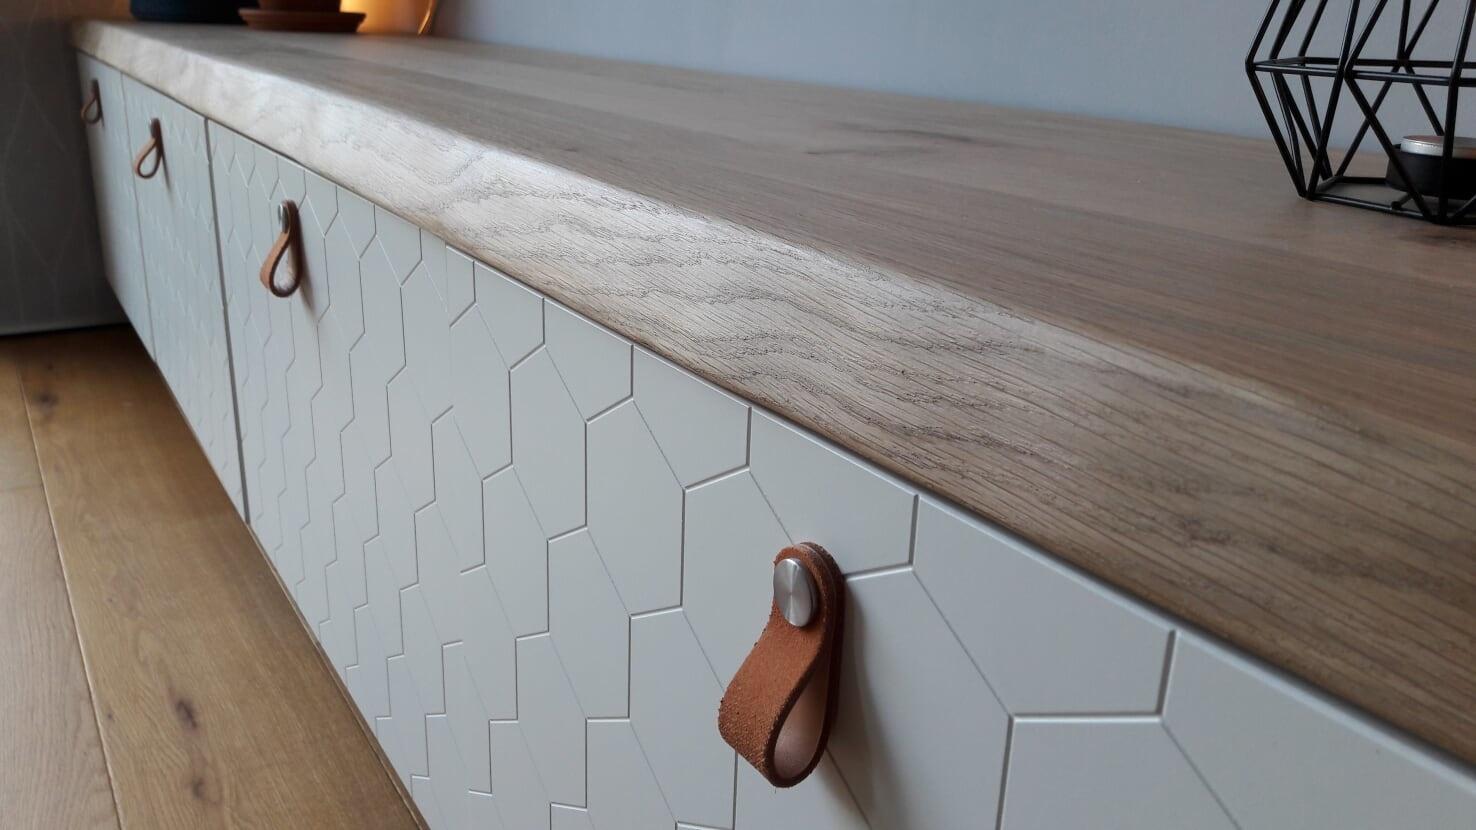 Eikenhouten plank op Ikea Besta tv-meubel